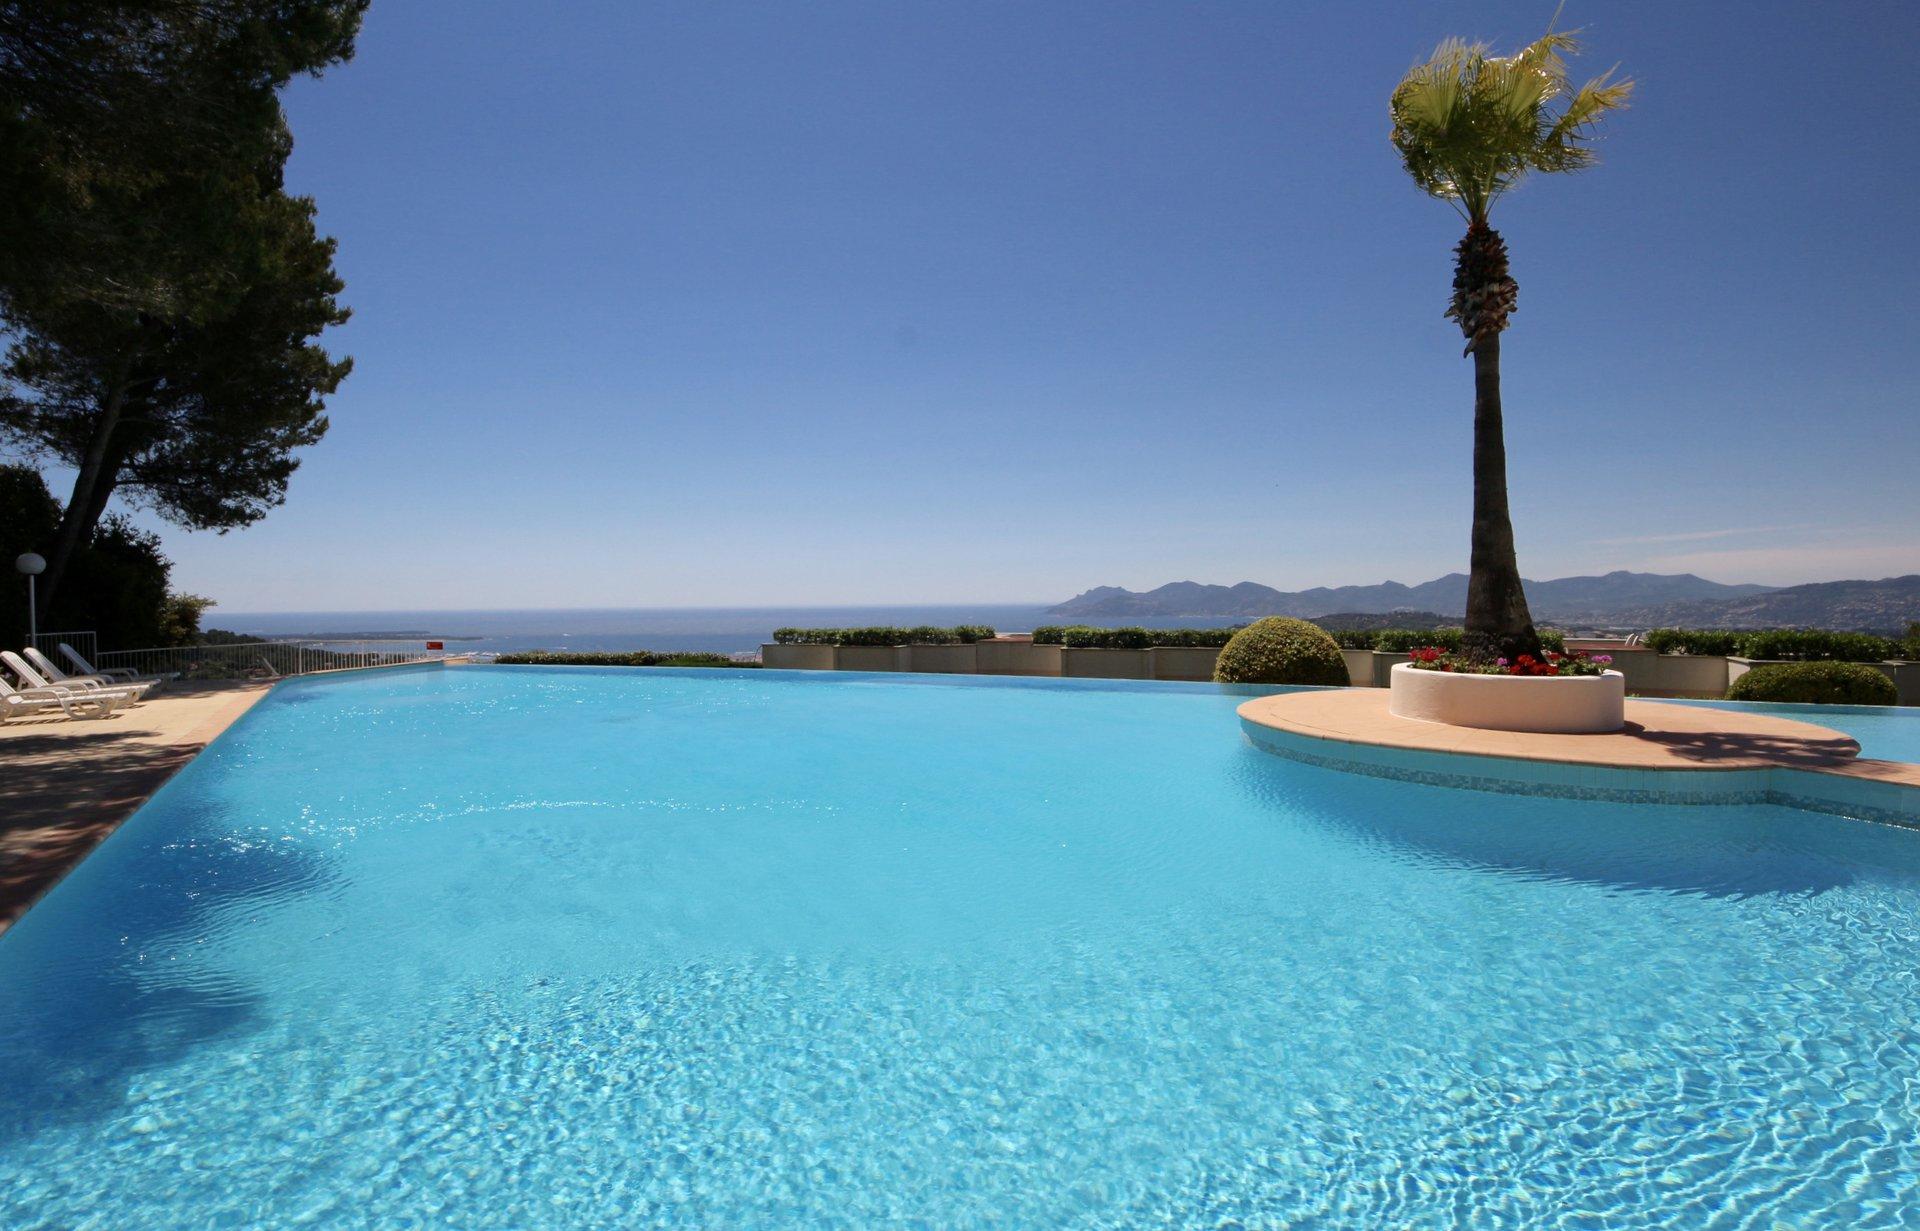 Le Cannet/Mougins, Superbe 2P. 50m2  avec garage et cave, superbe piscine vue mer